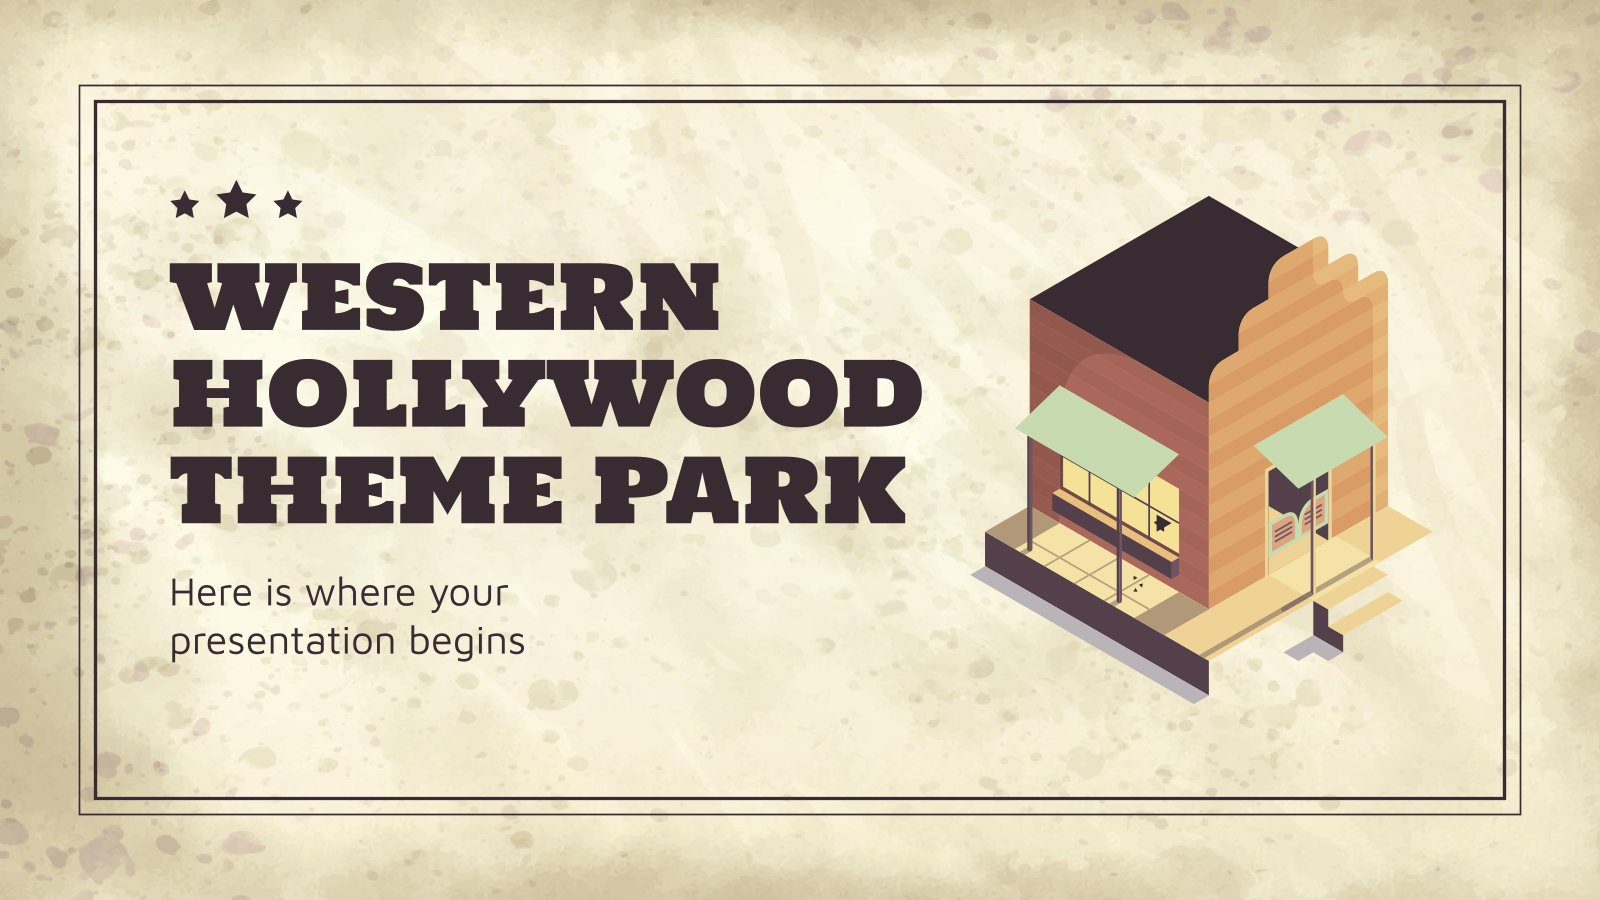 Western Hollywood Theme Park Minitheme presentation template